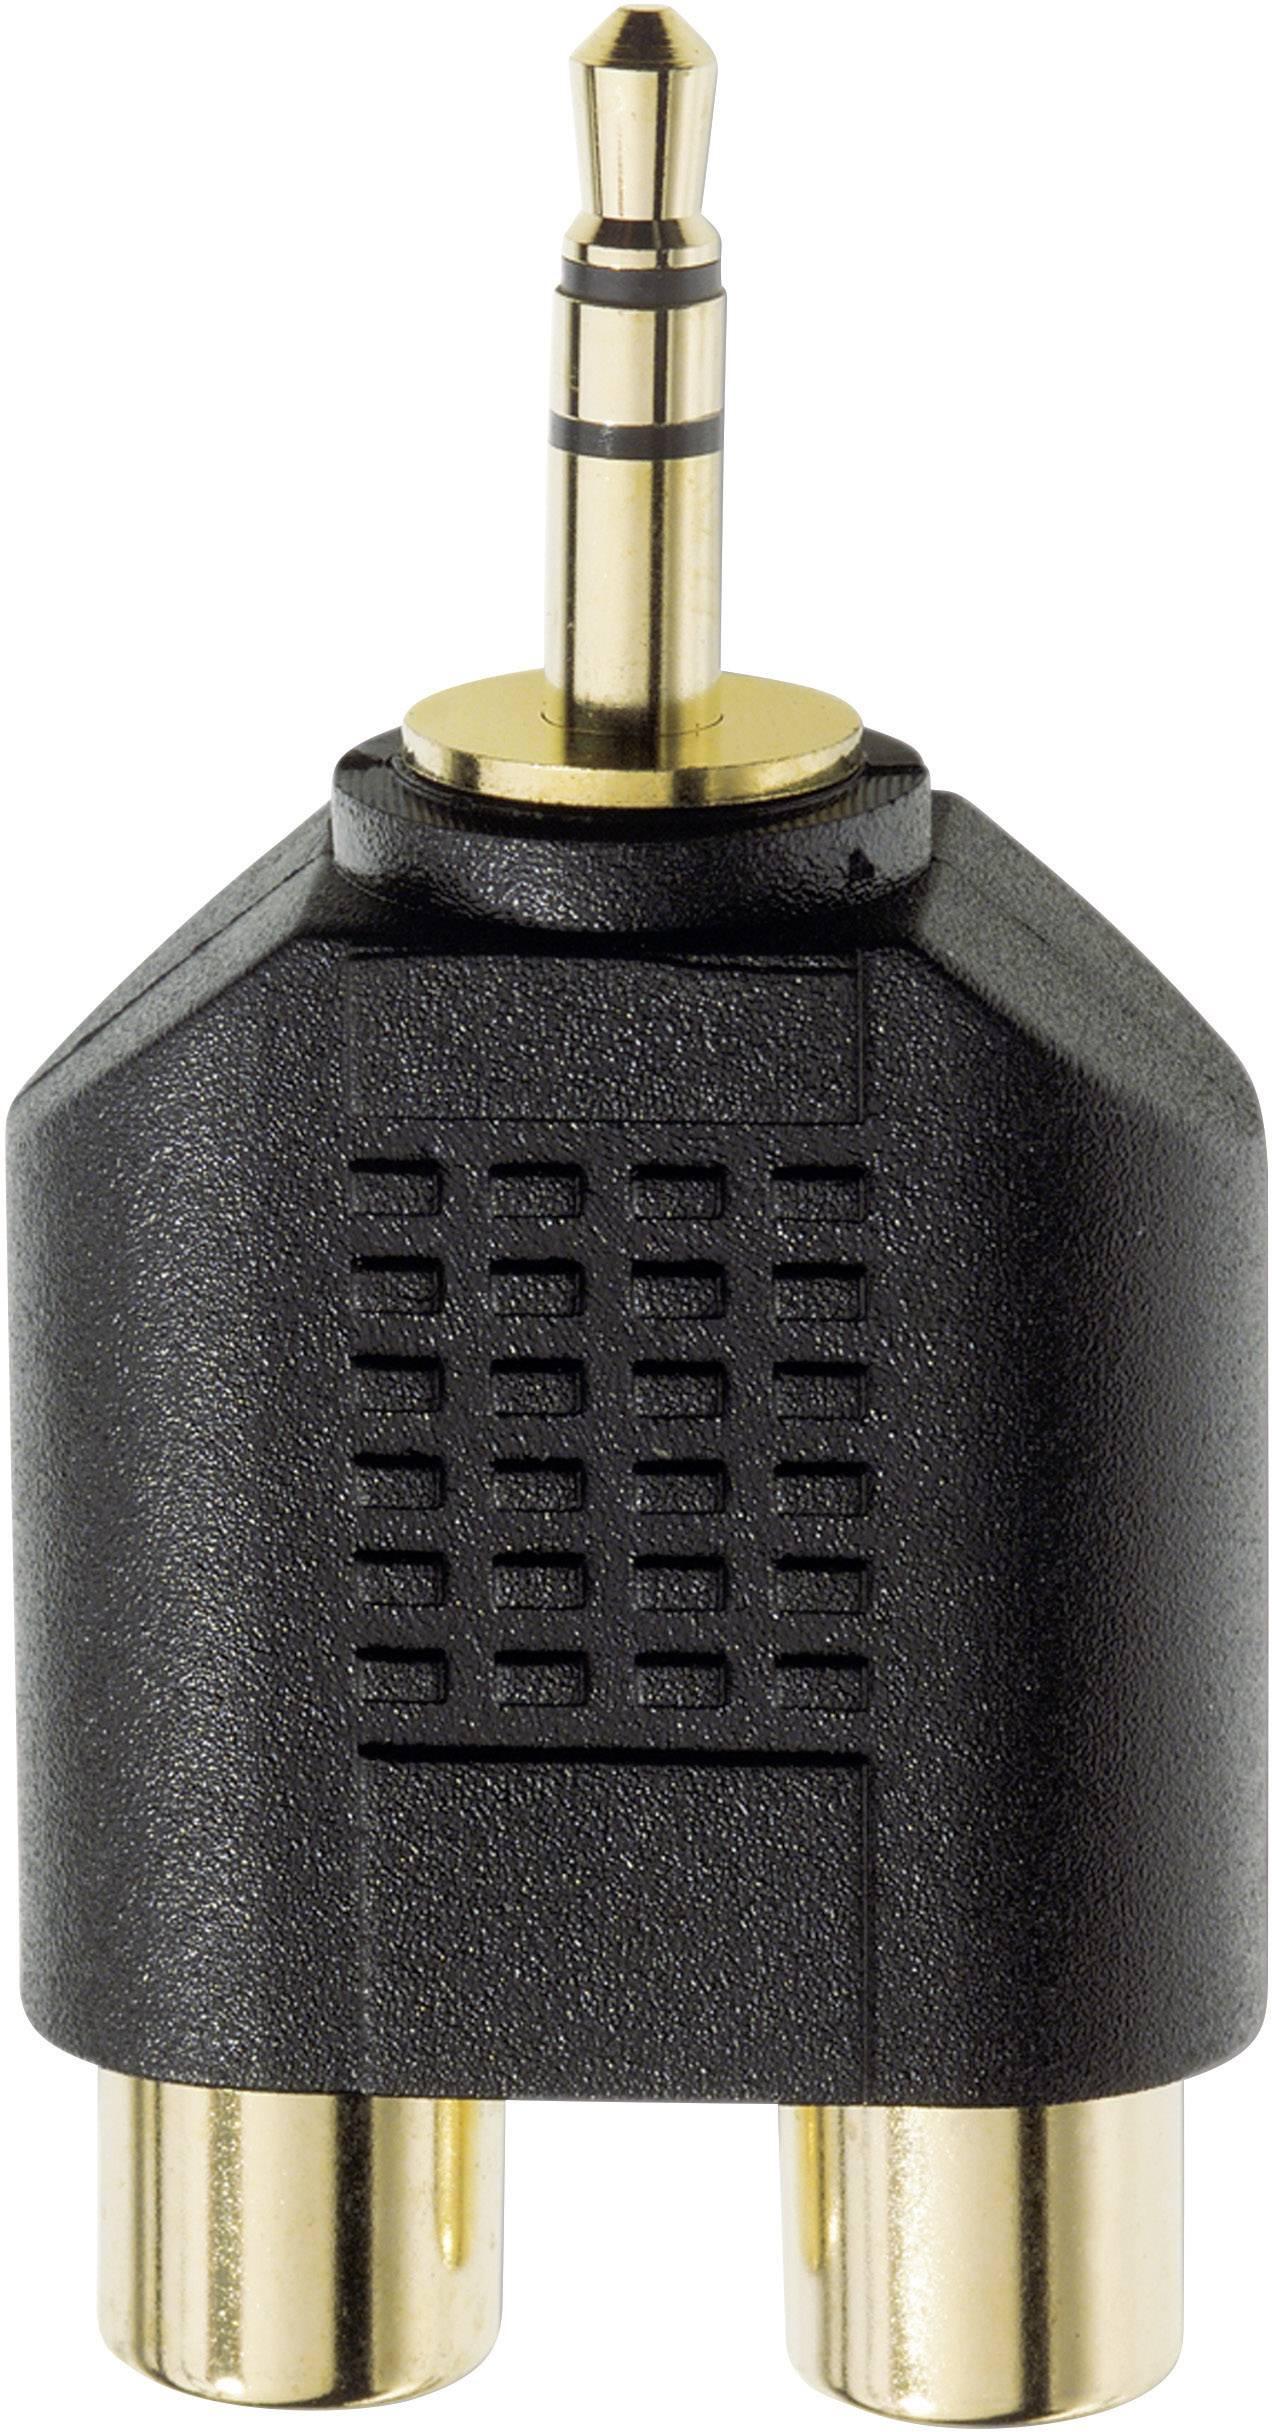 Jack / cinch audio Y adaptér Inakustik 0081381, černá